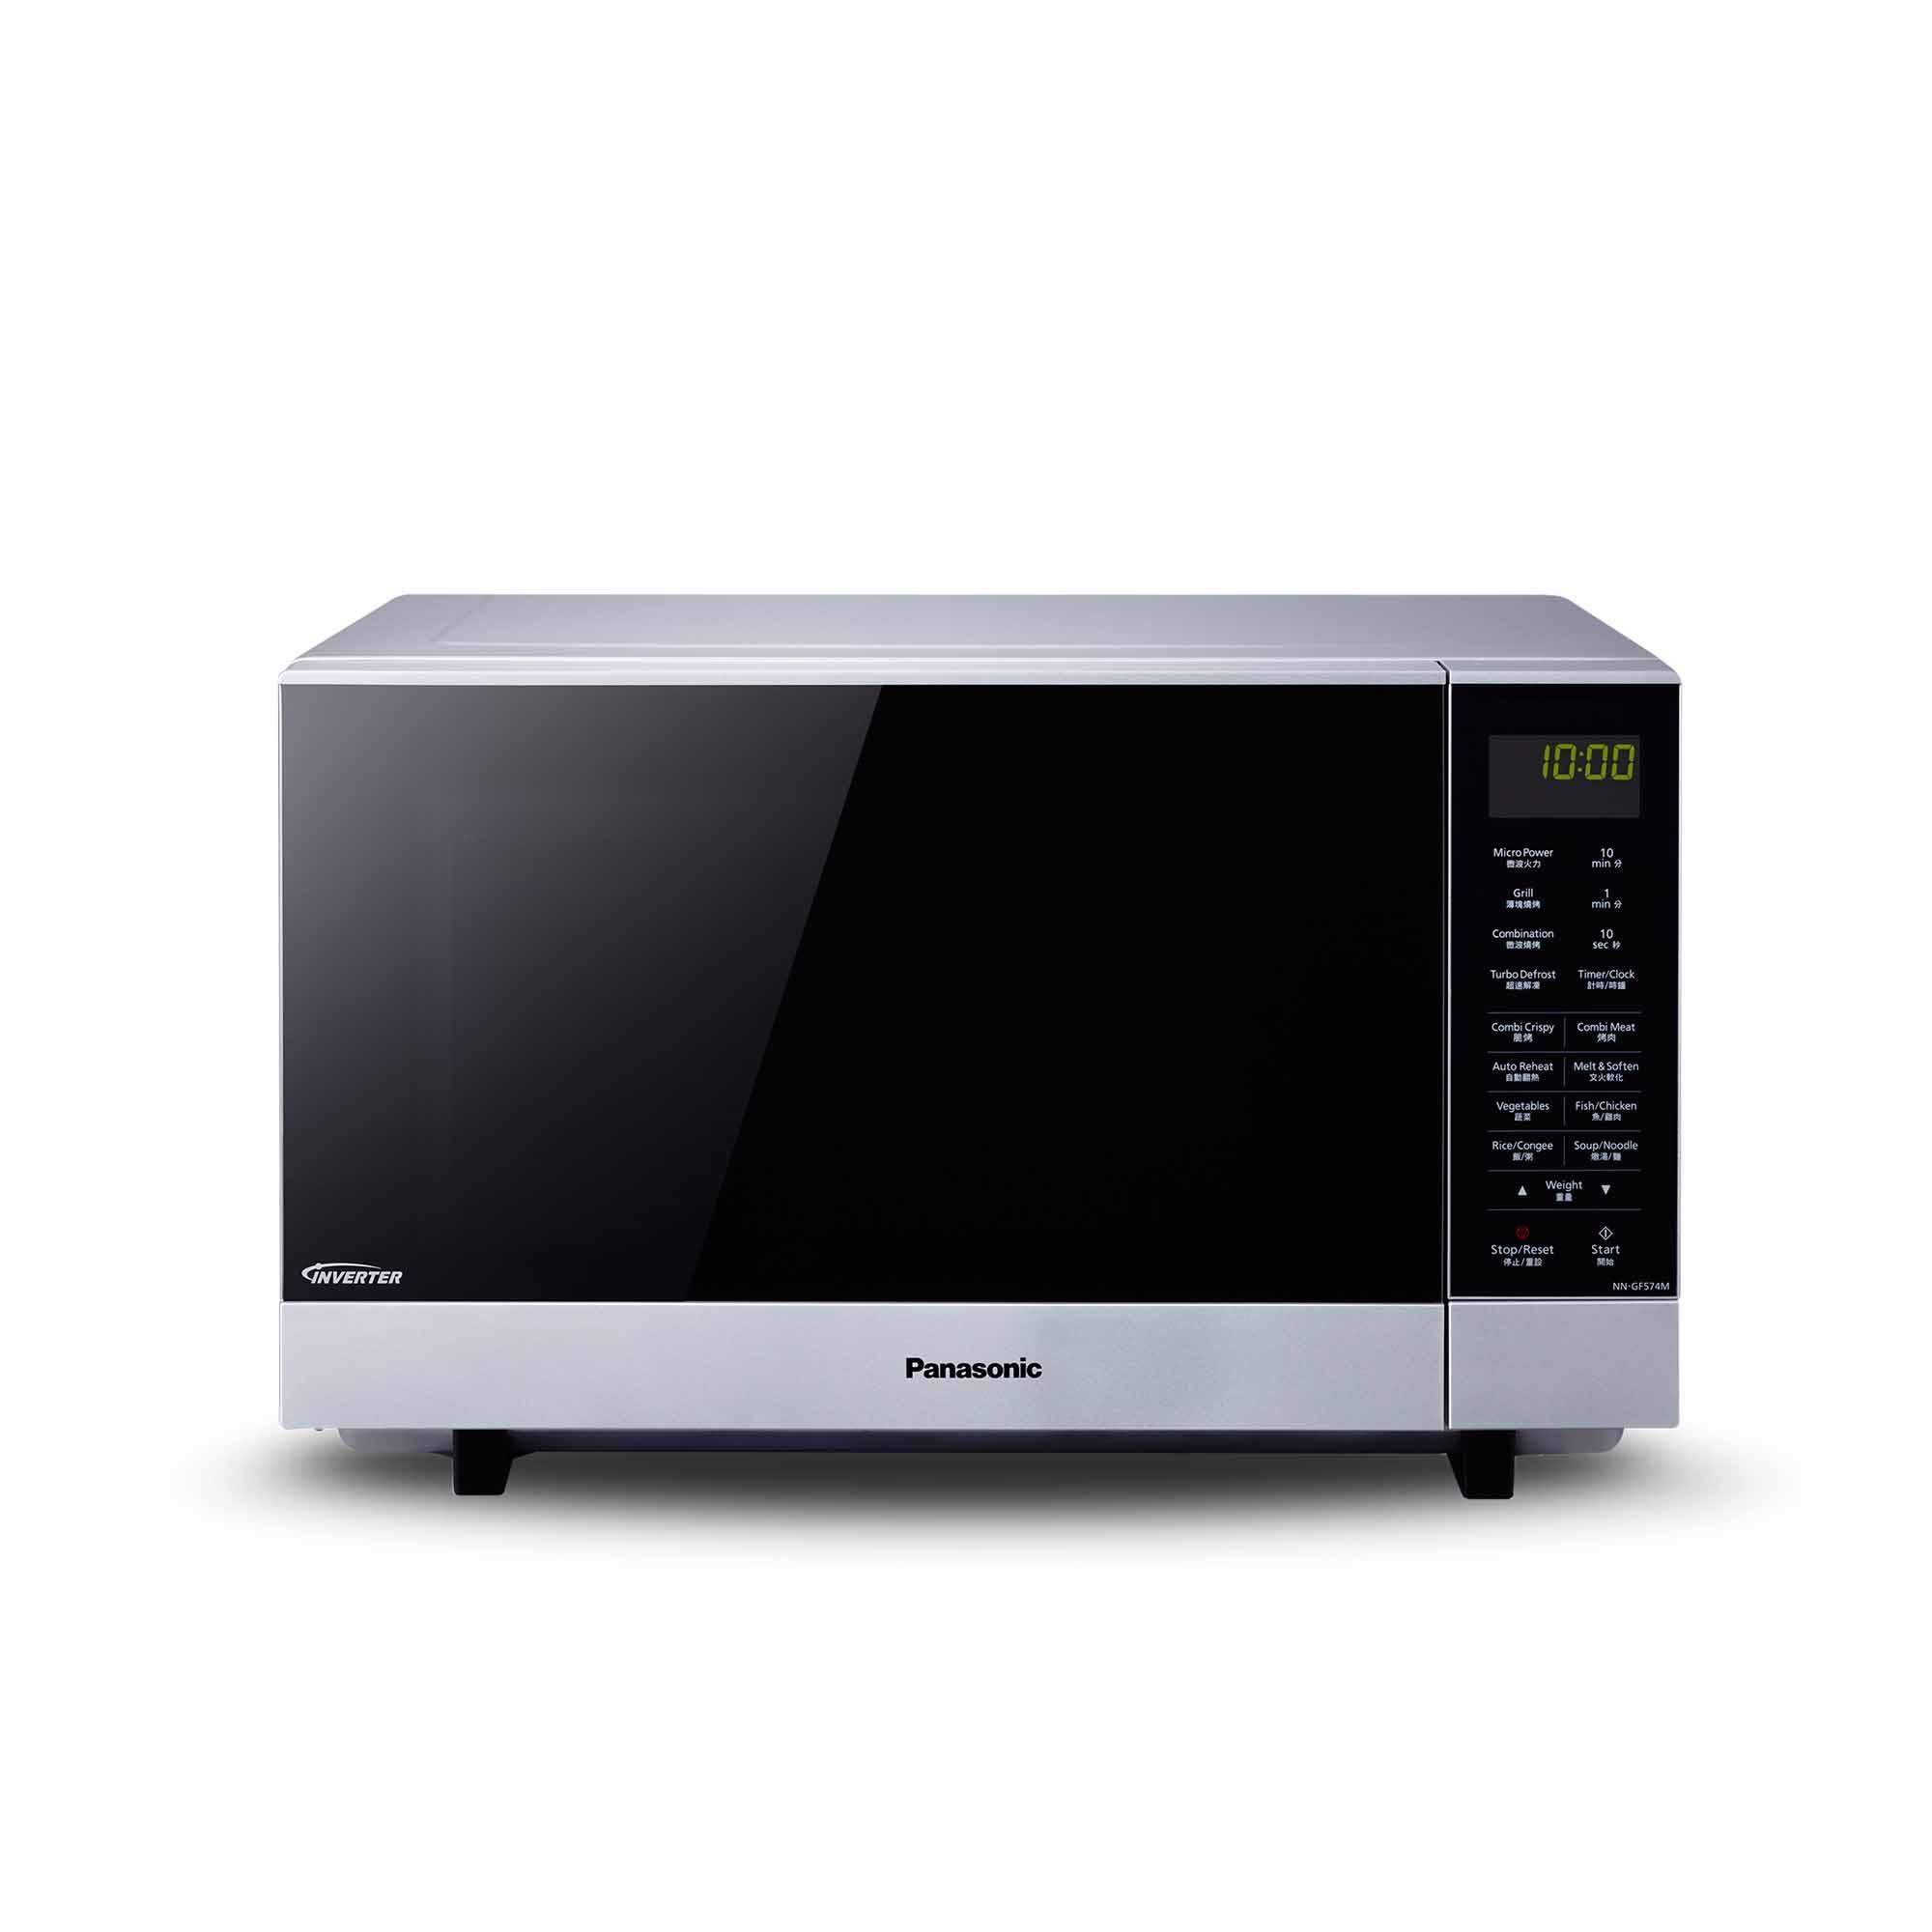 Microwave Ovens Panasonic Bestmicrowave